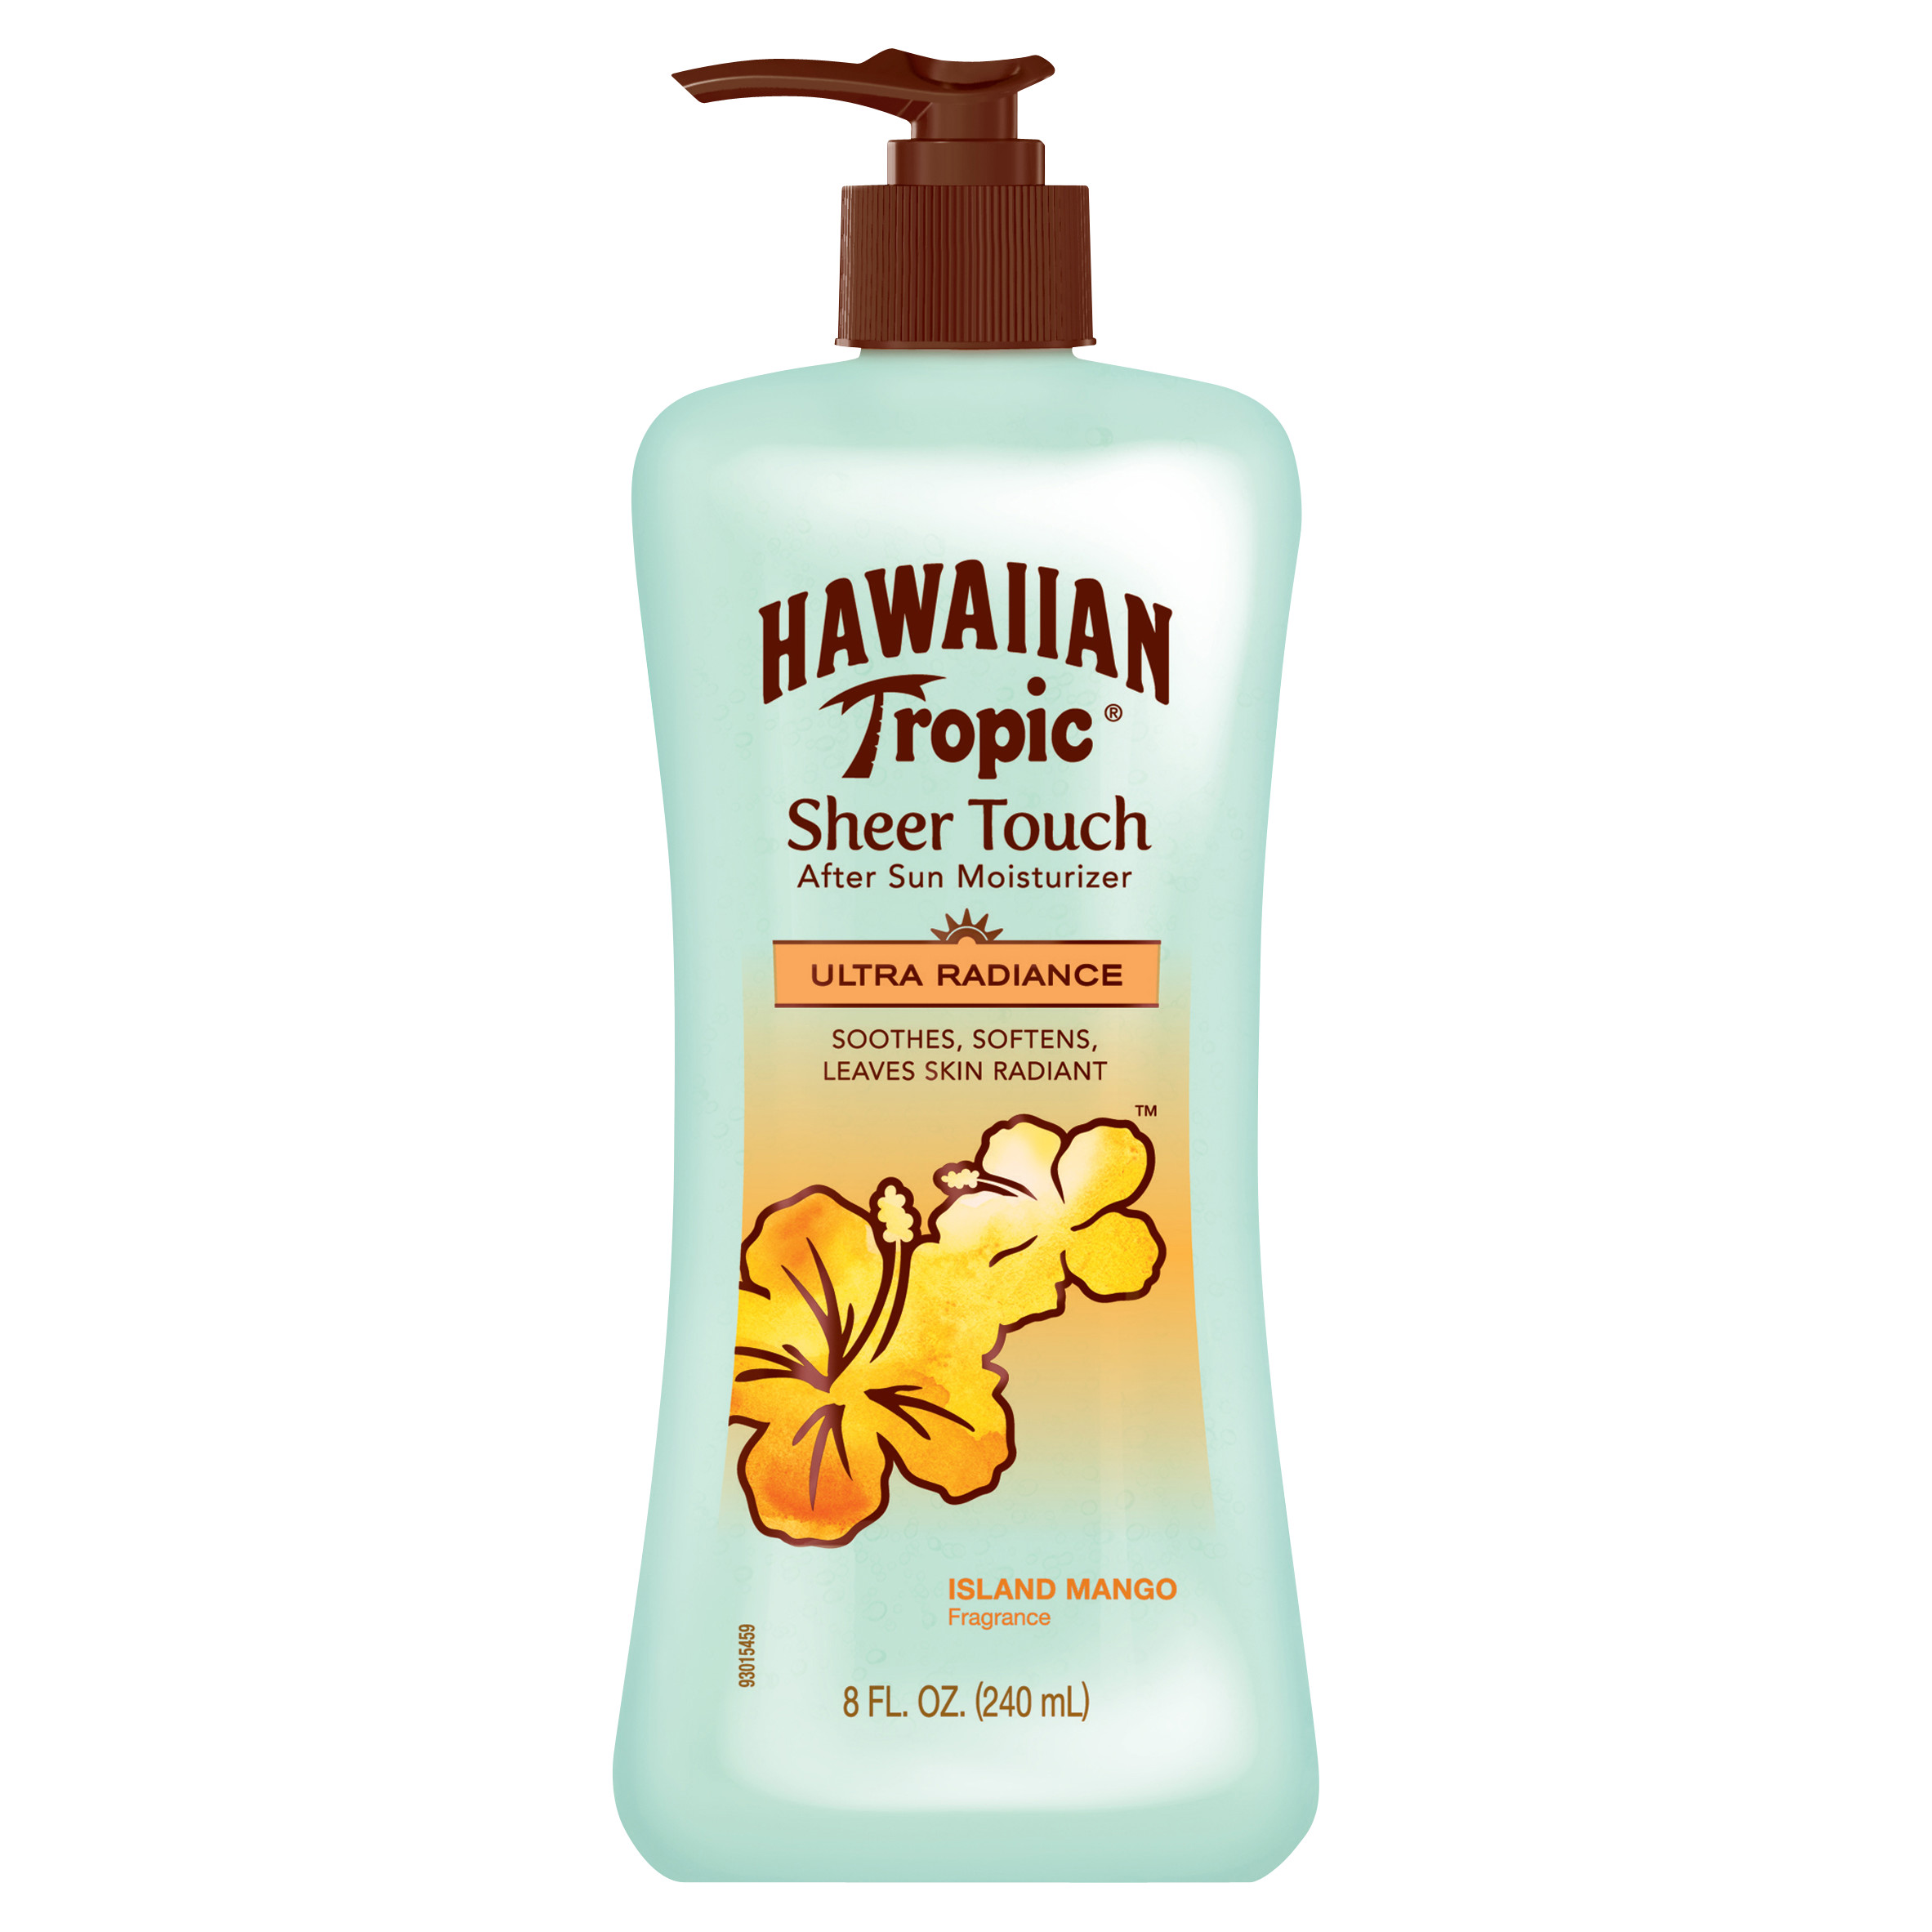 Hawaiian Tropic Sheer Touch Island Mango After Sun Moisturizer - 8 Ounces